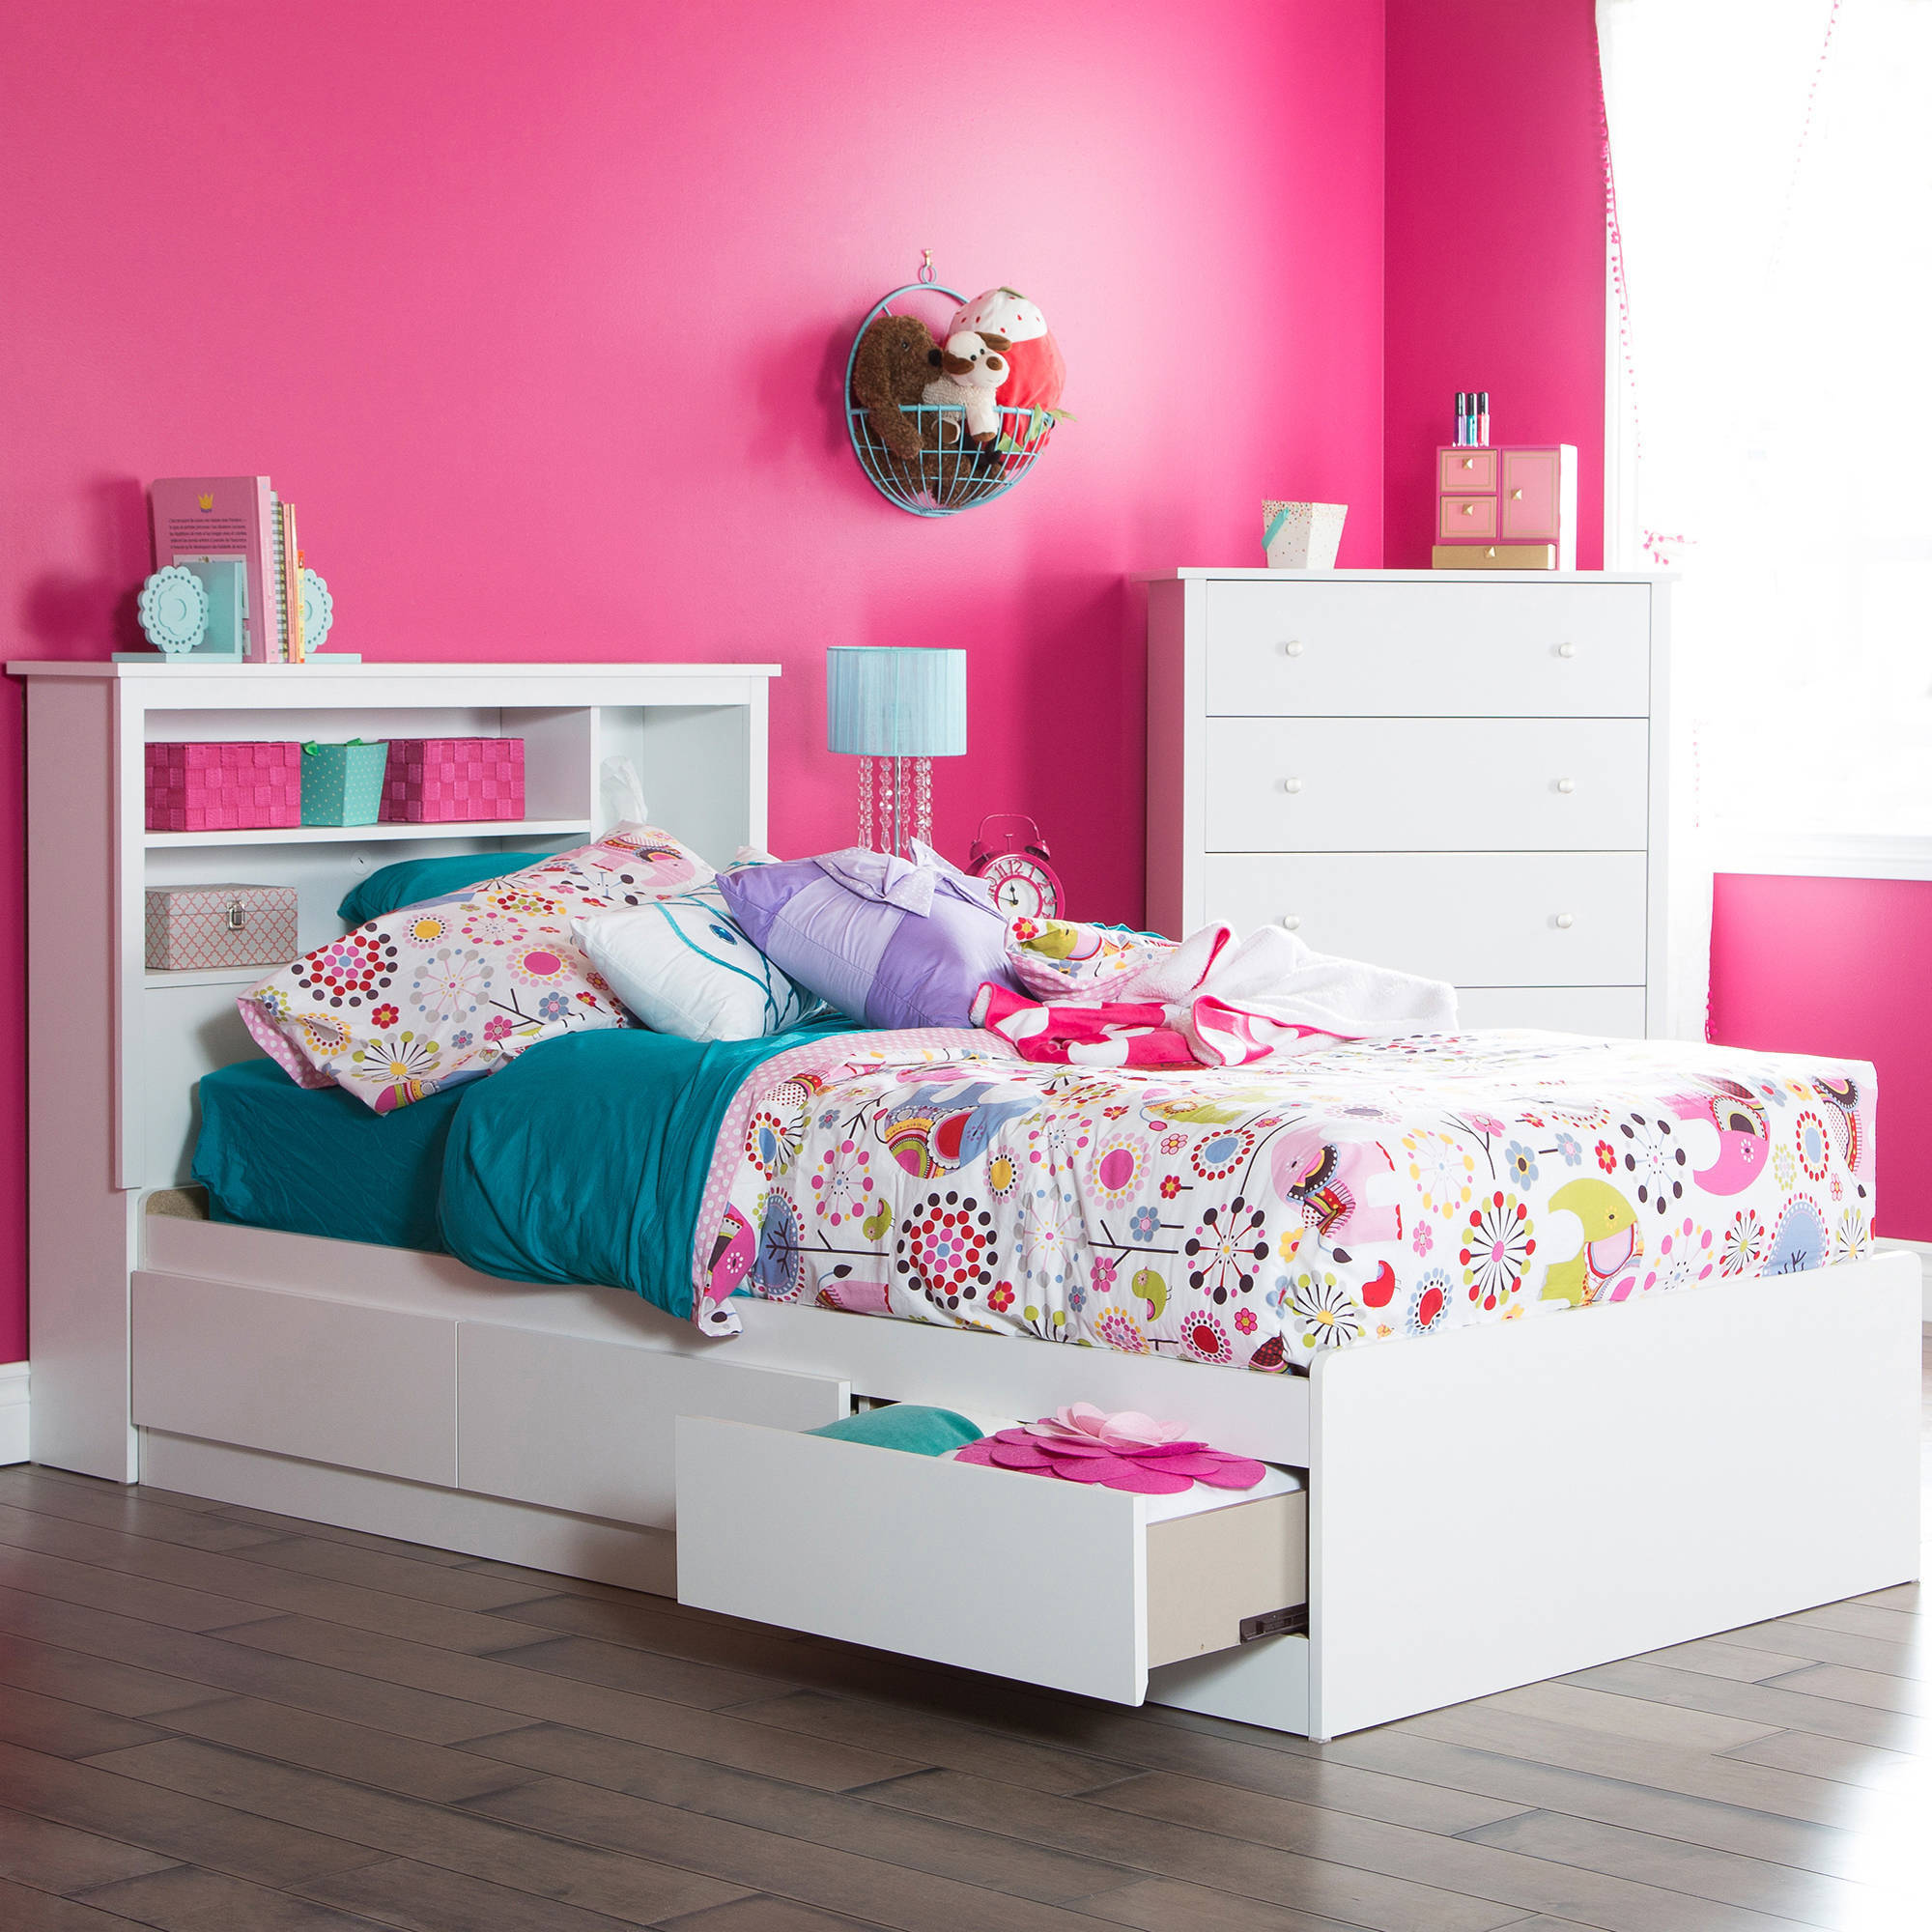 affordable bedroom furniture for girls photo - 5